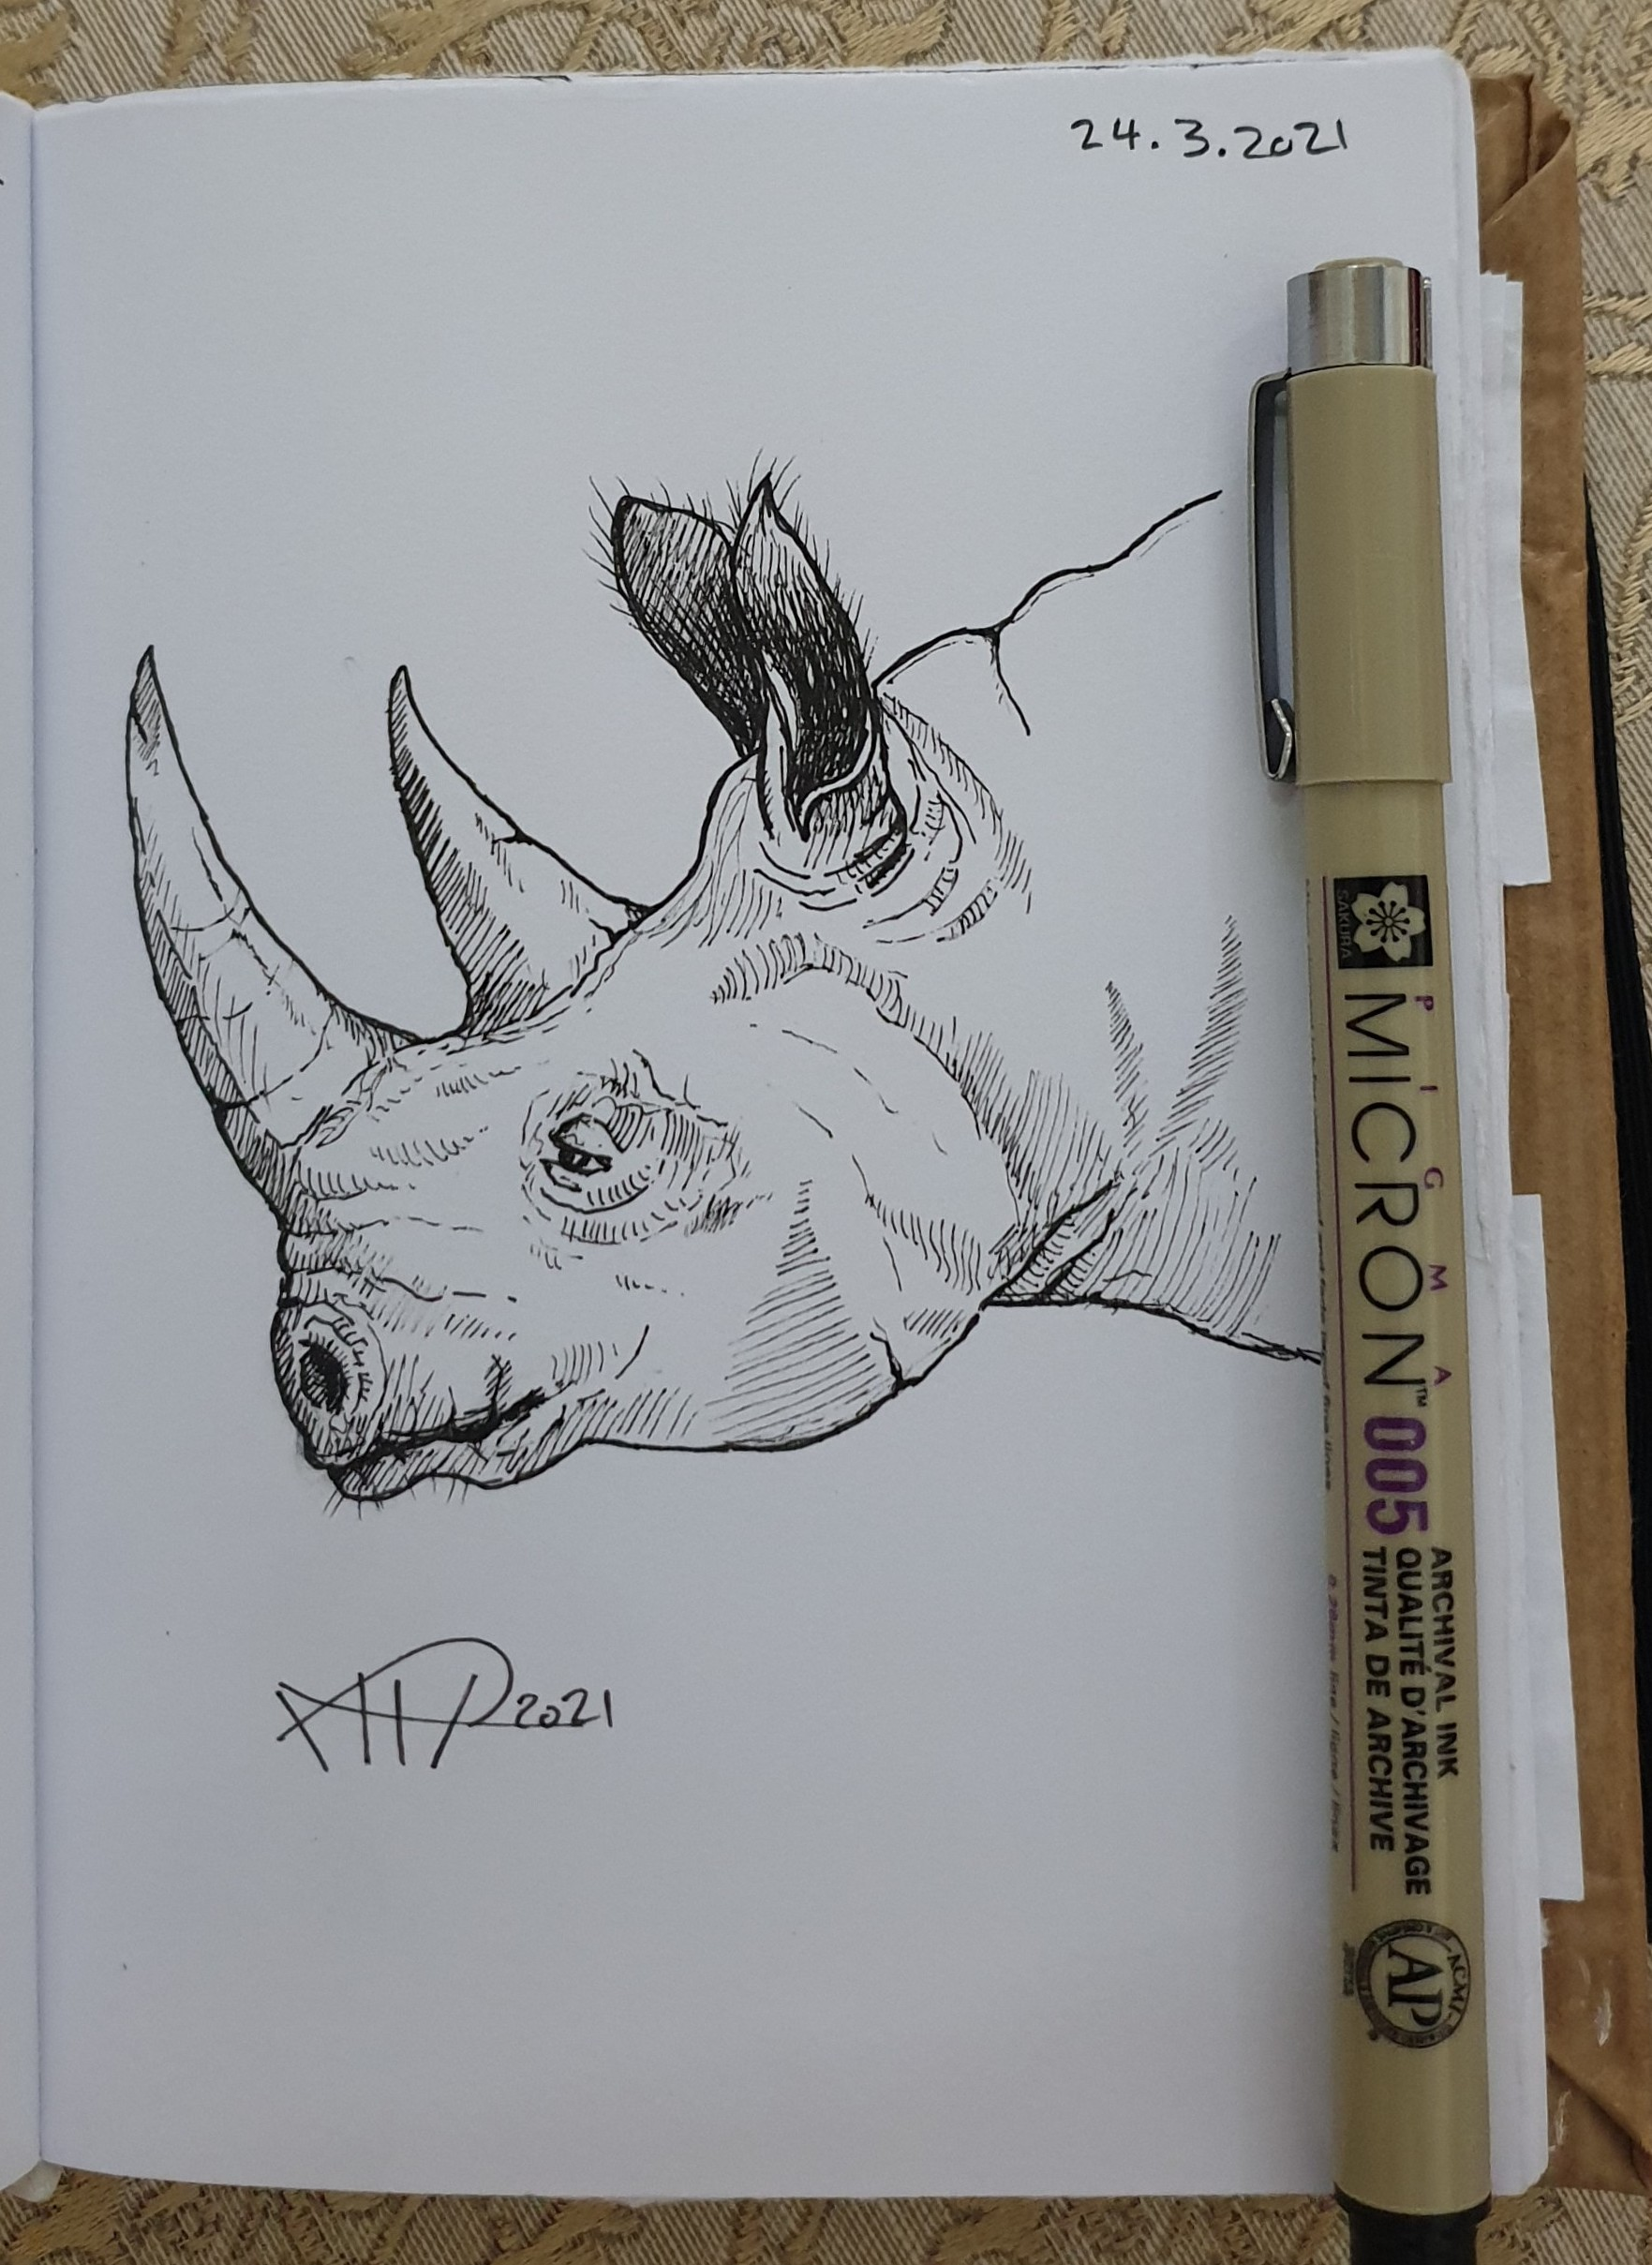 ali radwani sketchbook sketch rhion animal pencil black ink pen